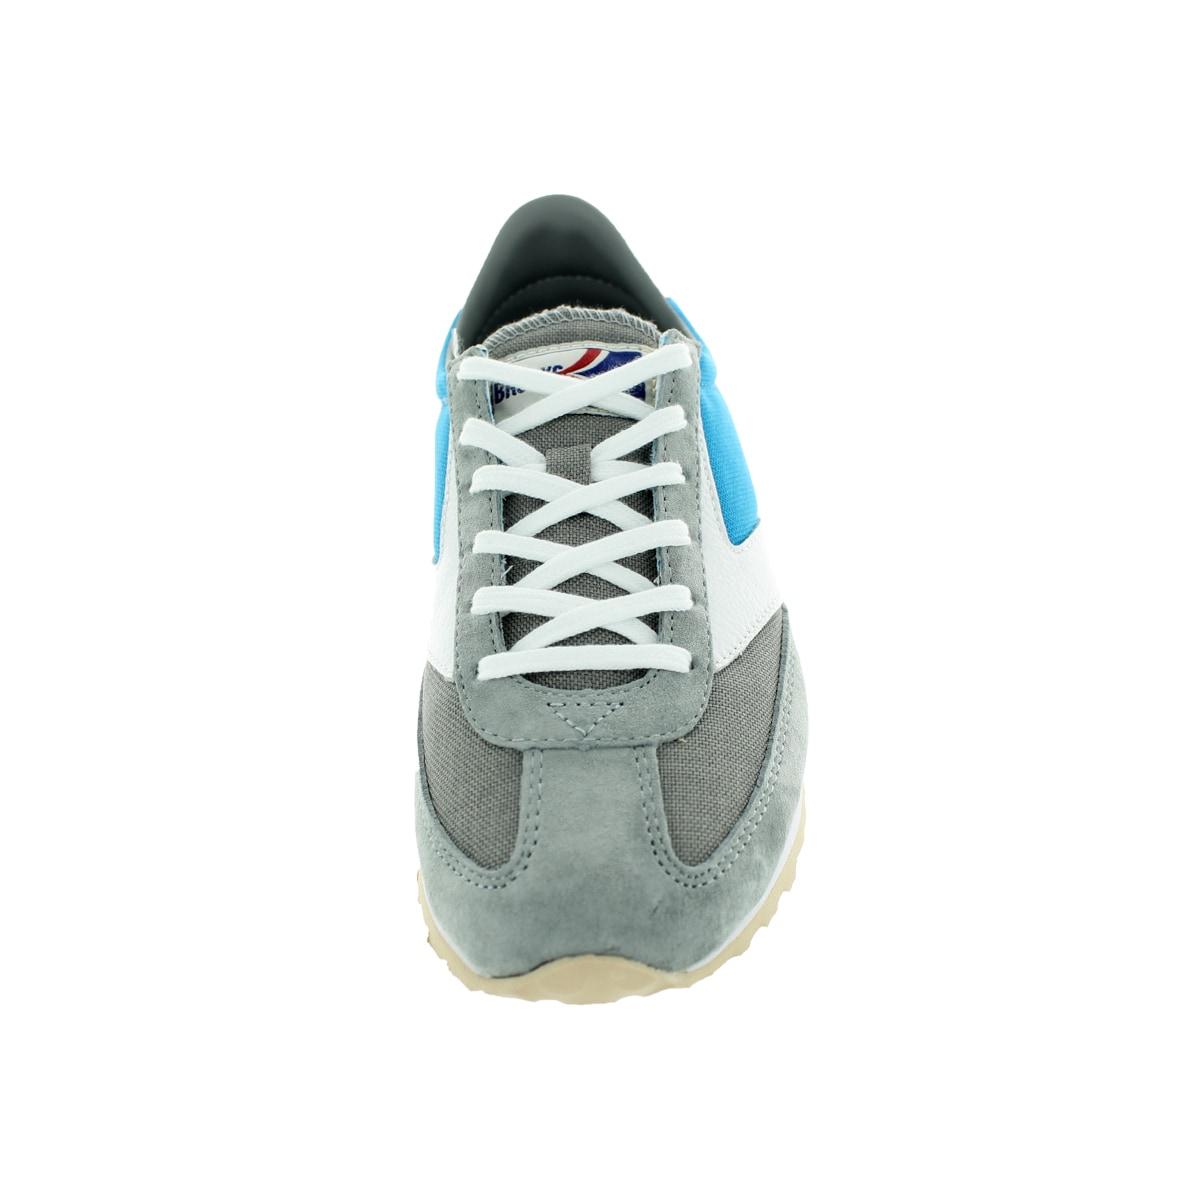 Brooks Women's Vanguard DivaBlue/Neutraulgrey/White Running Shoe - Free  Shipping Today - Overstock.com - 19157166